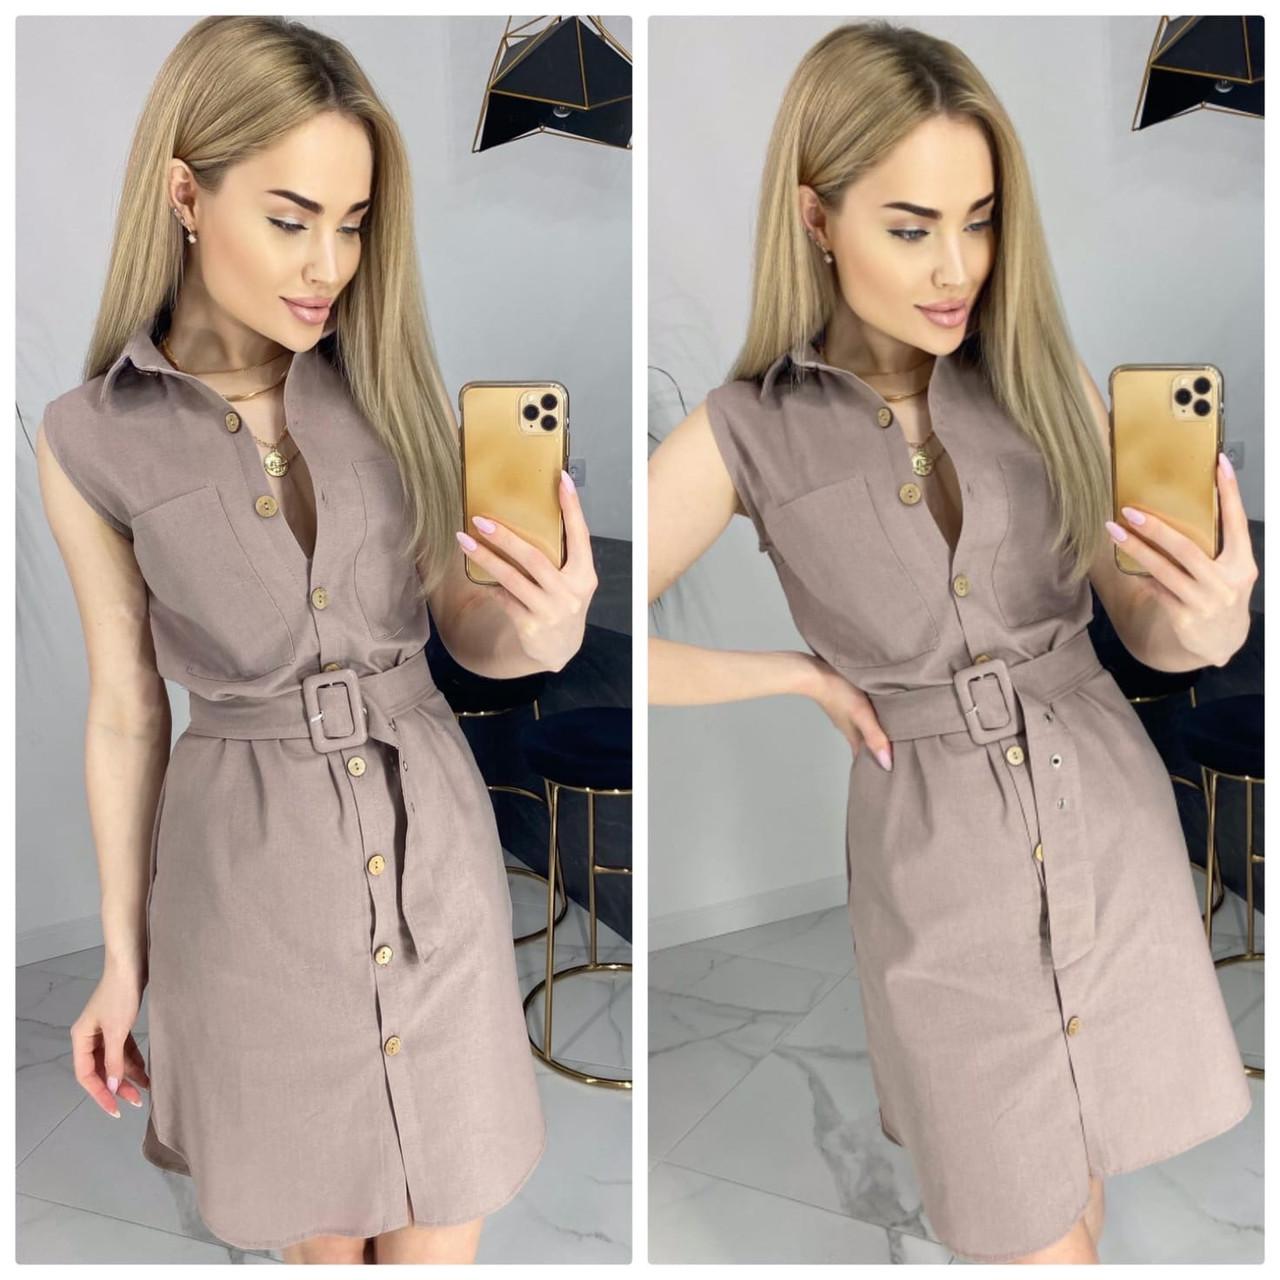 Платье-рубашка длиною до середины бедра без рукавов